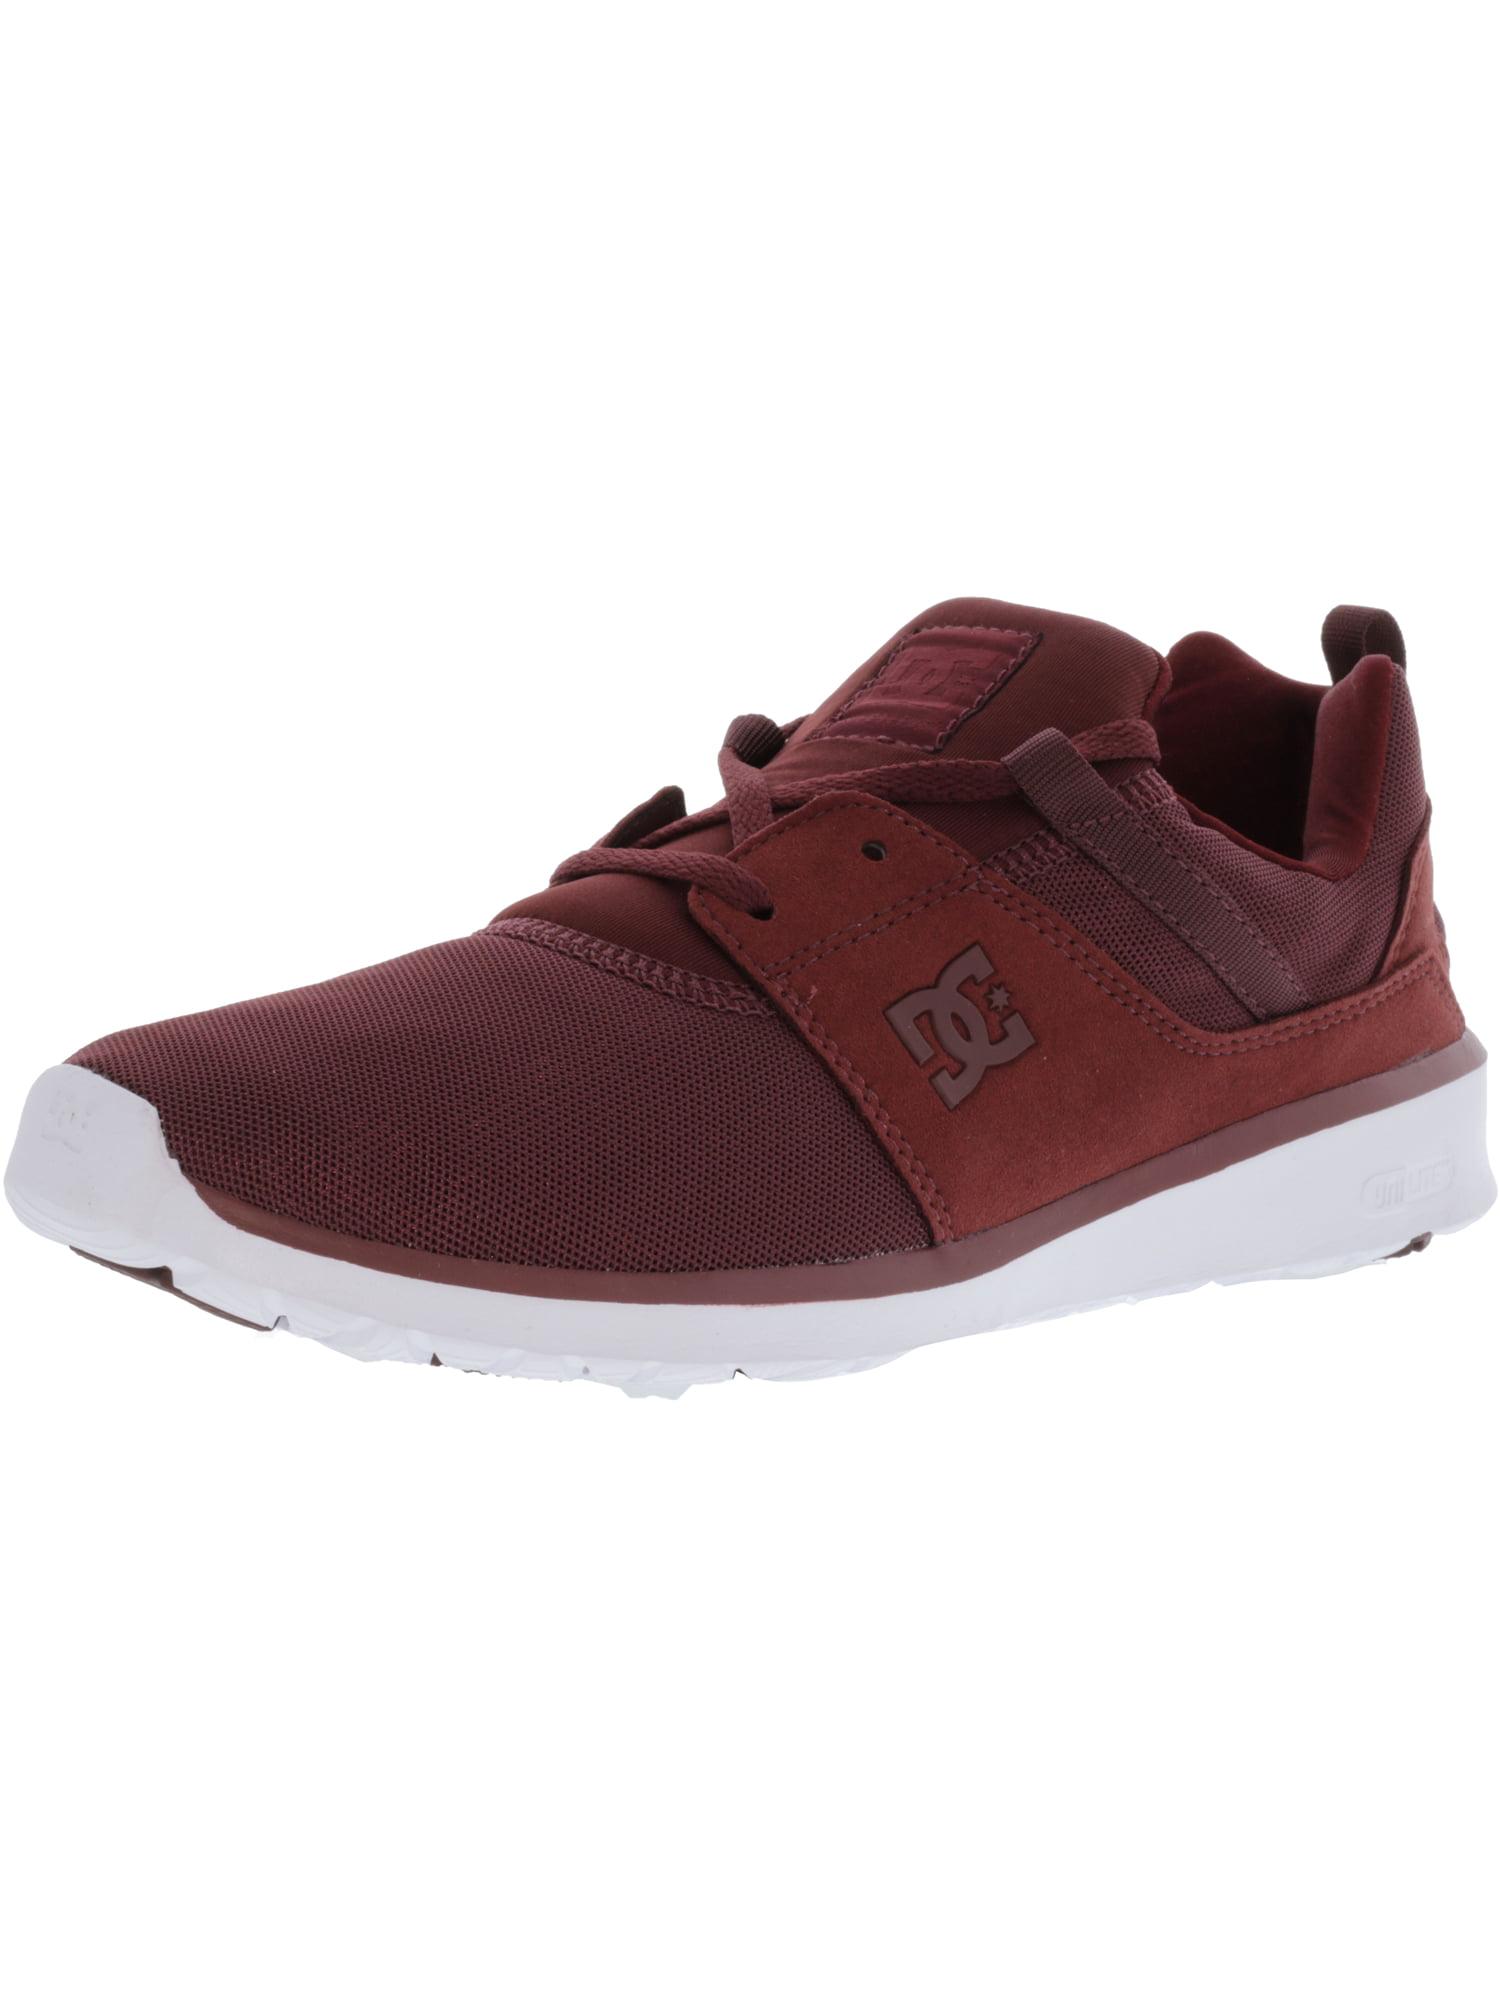 Dc Men's Heathrow Red / White Ankle-High Fashion Sneaker - 7.5M